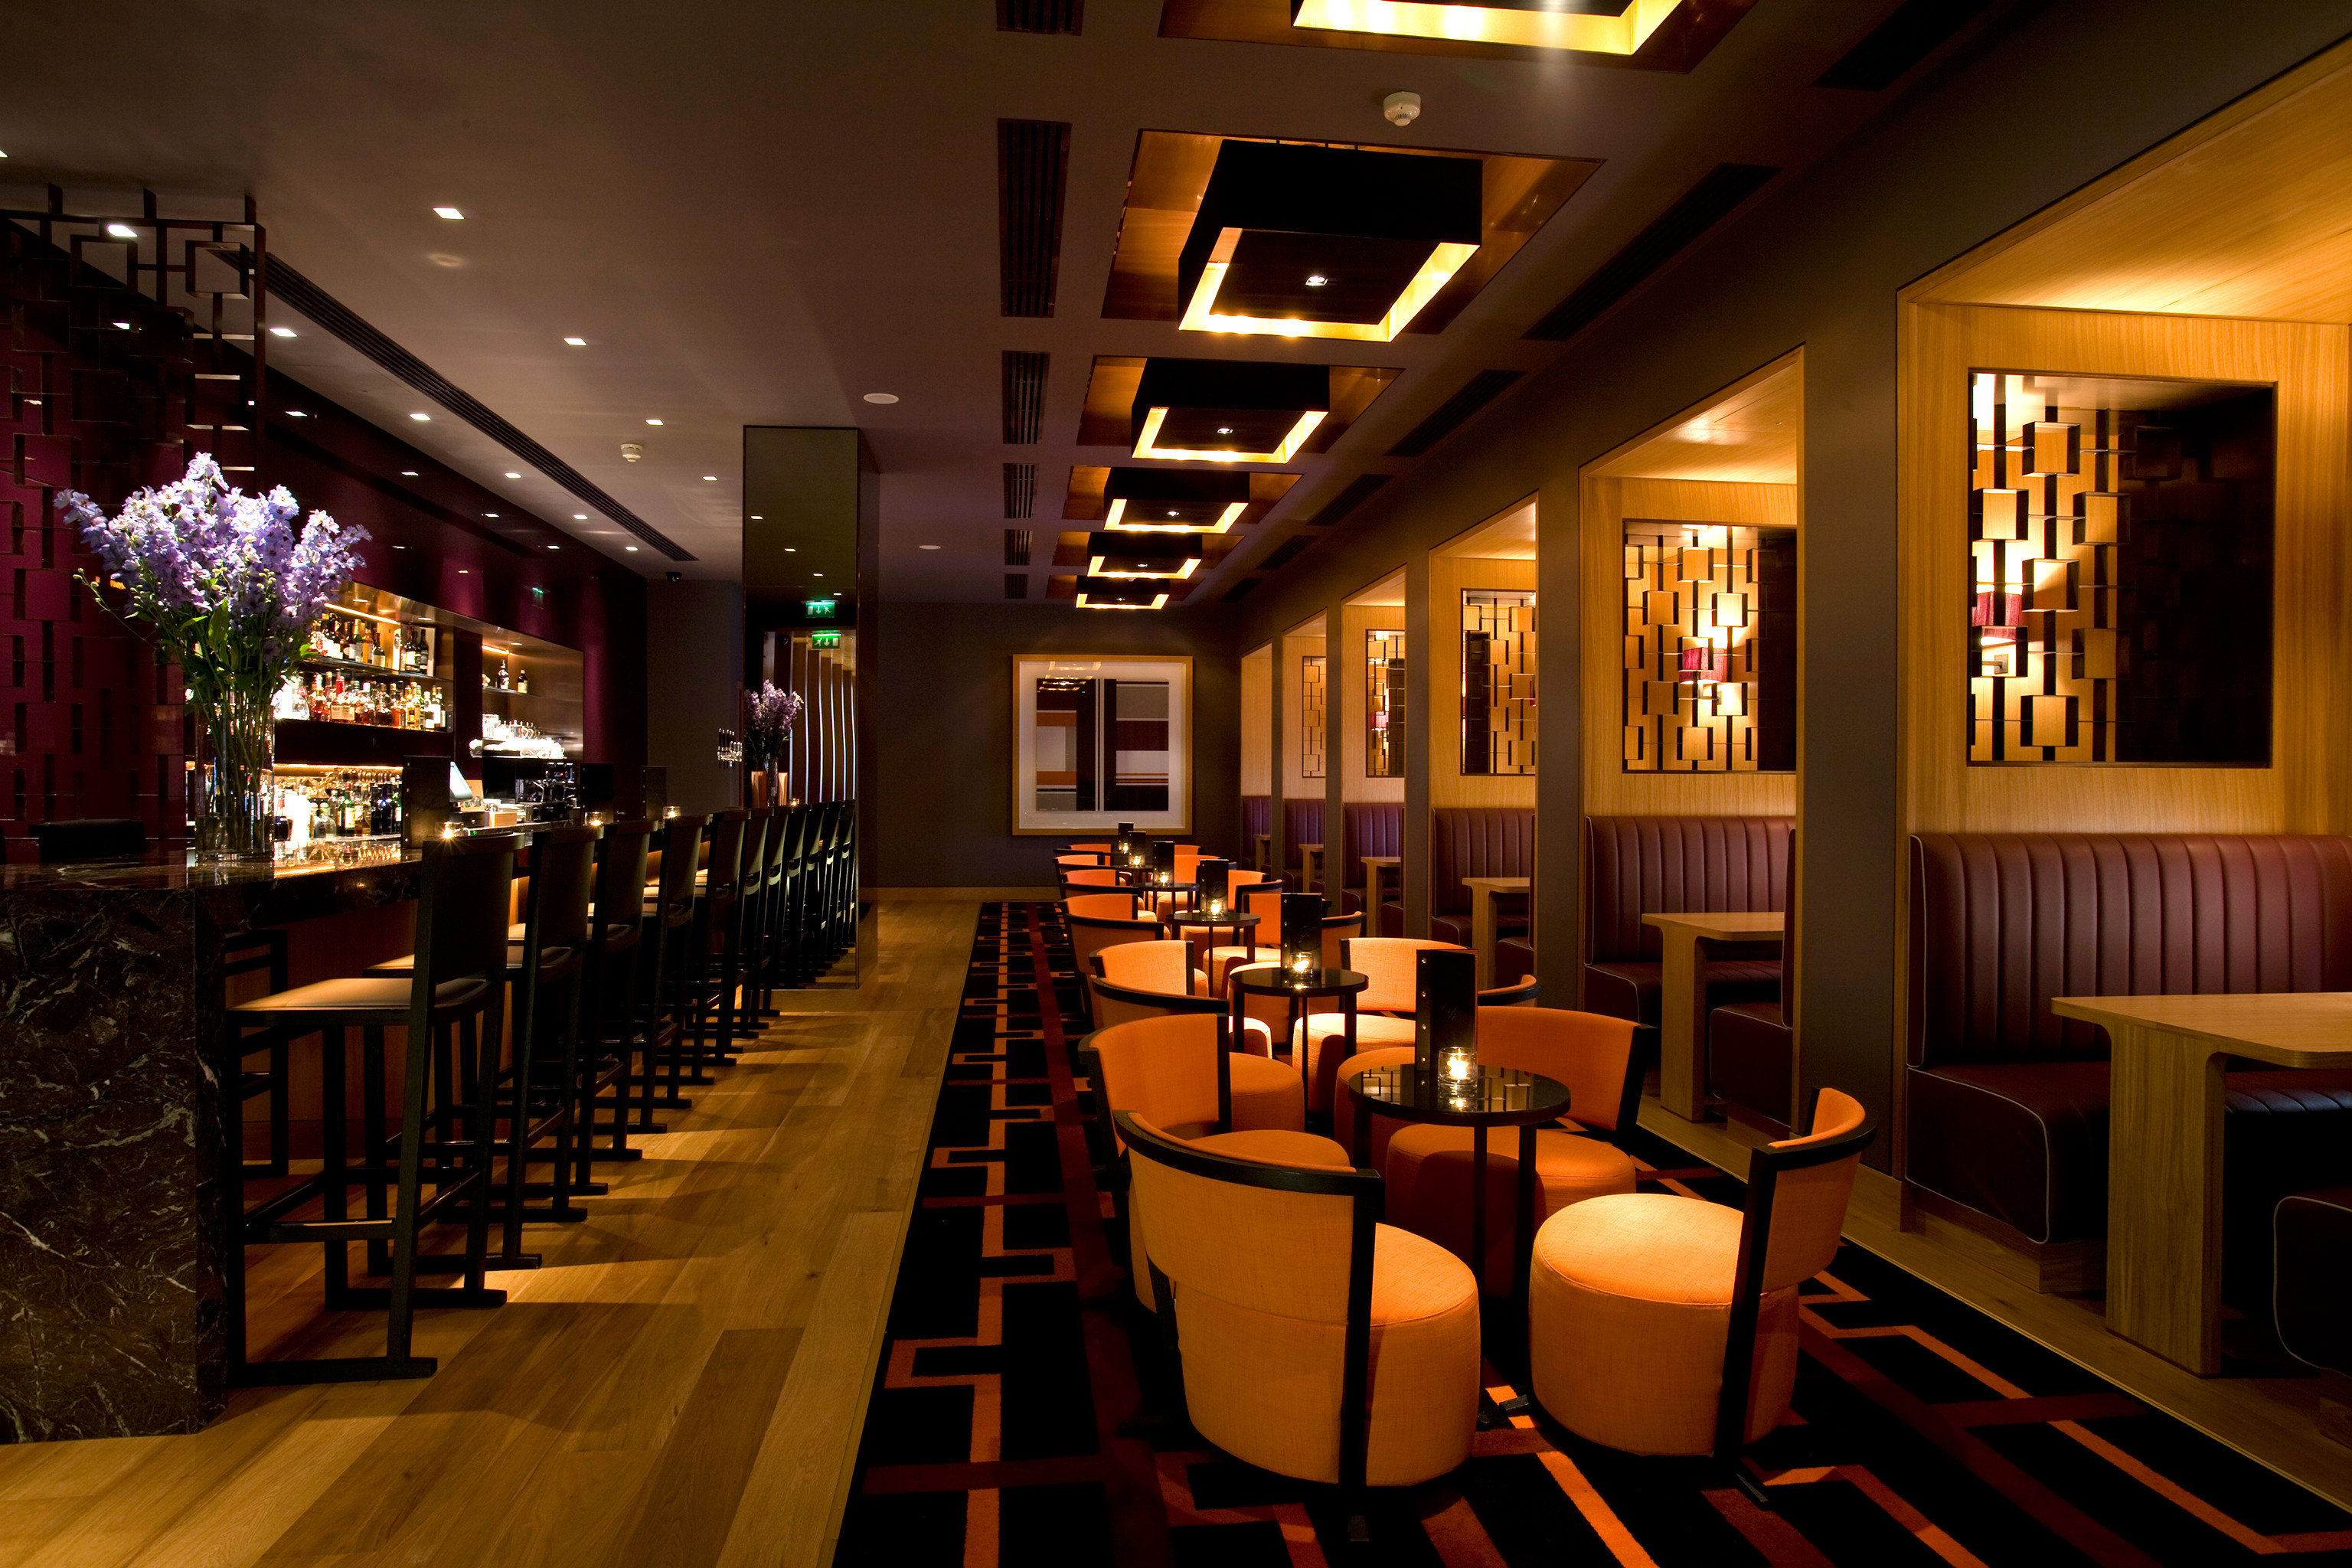 Bar Dining Drink Eat Luxury Modern restaurant function hall café long empty lined